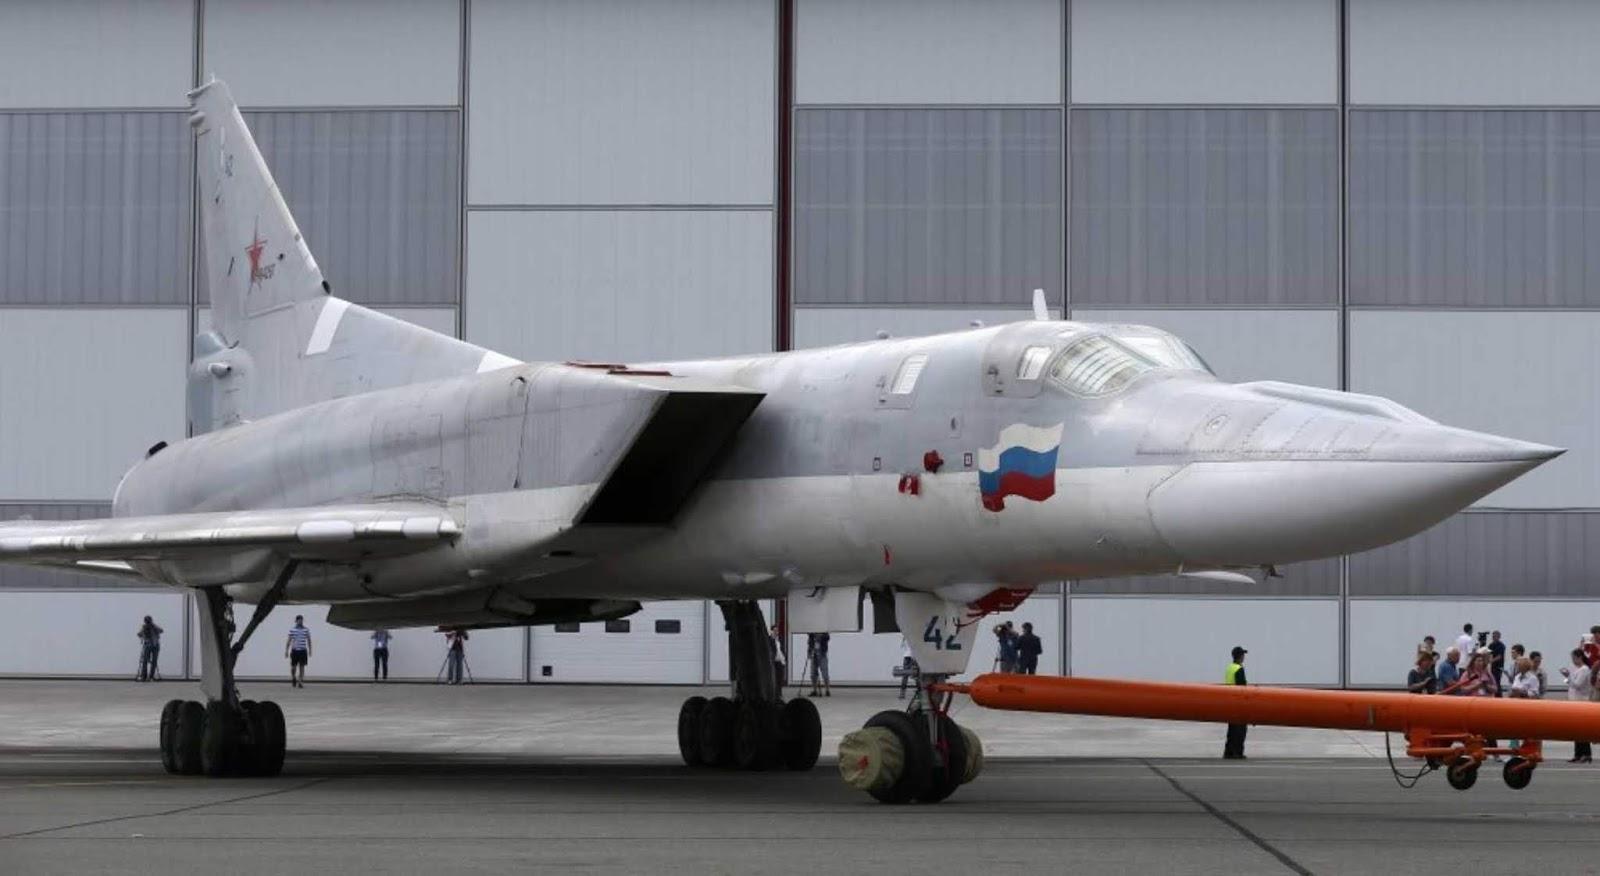 Uji Terbang Pembom Tu-22M3M di Undur Menjadi bulan November